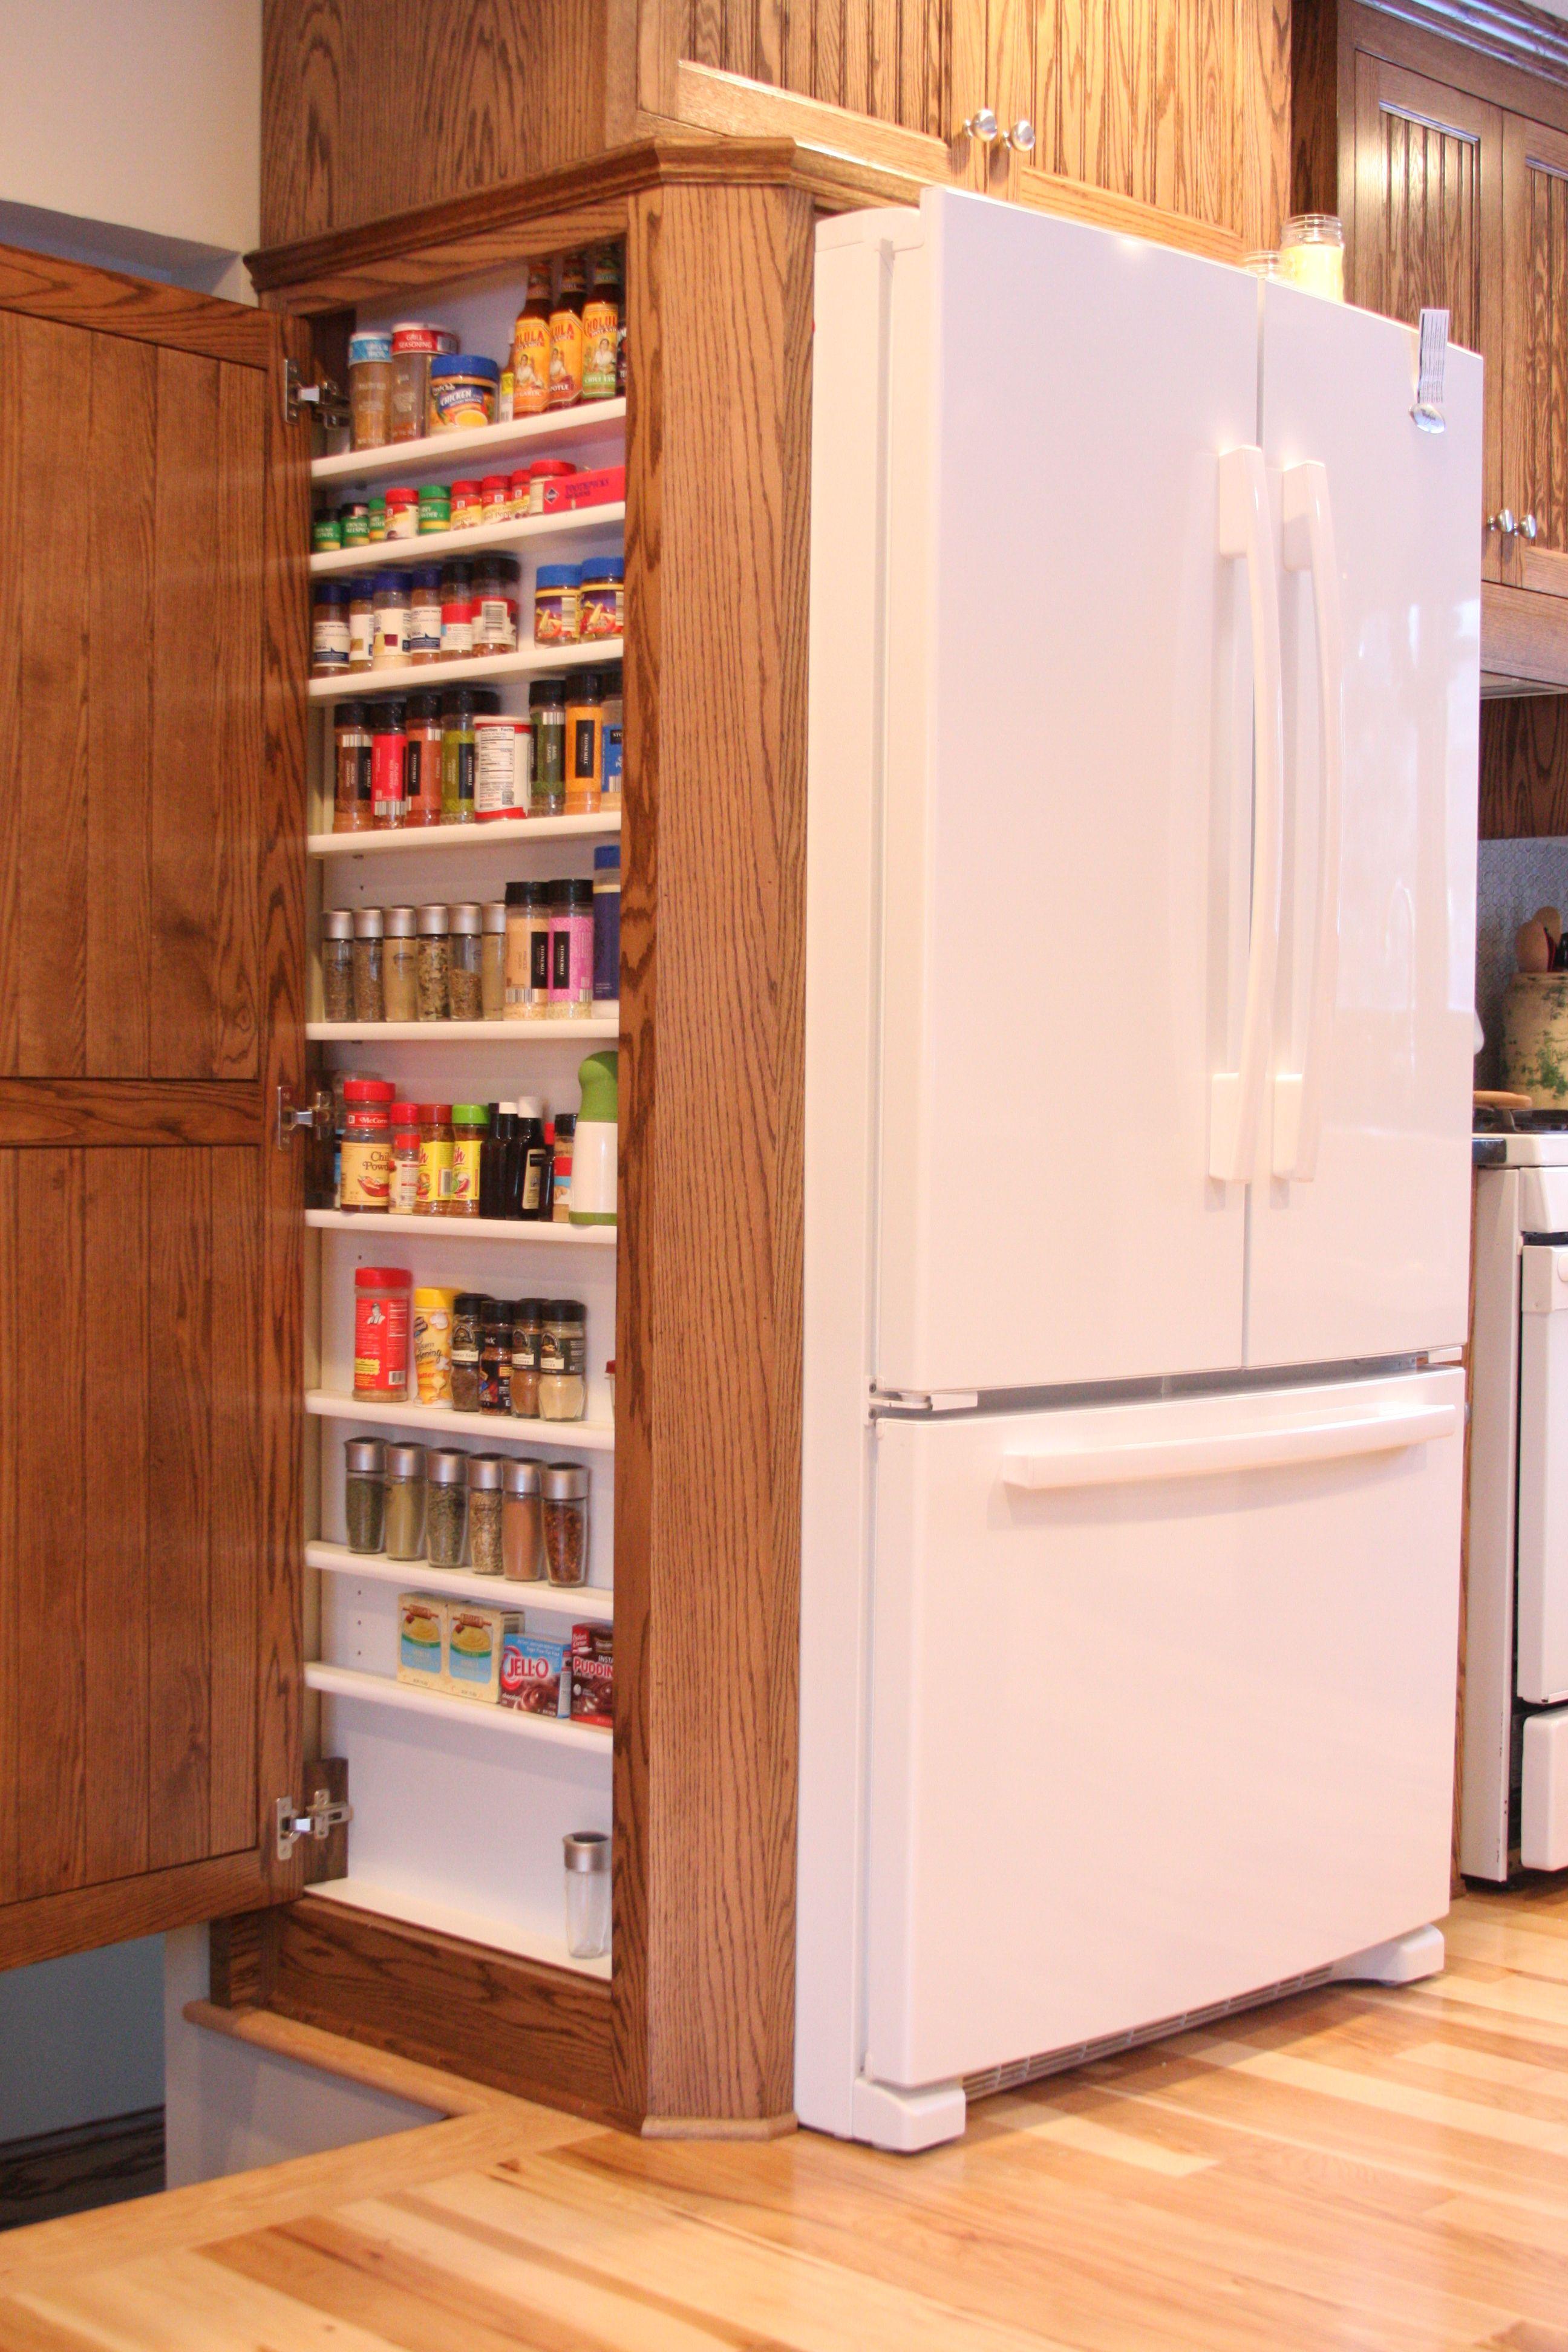 home cabinets cabinet organizing ideas organization kitchen design good plan